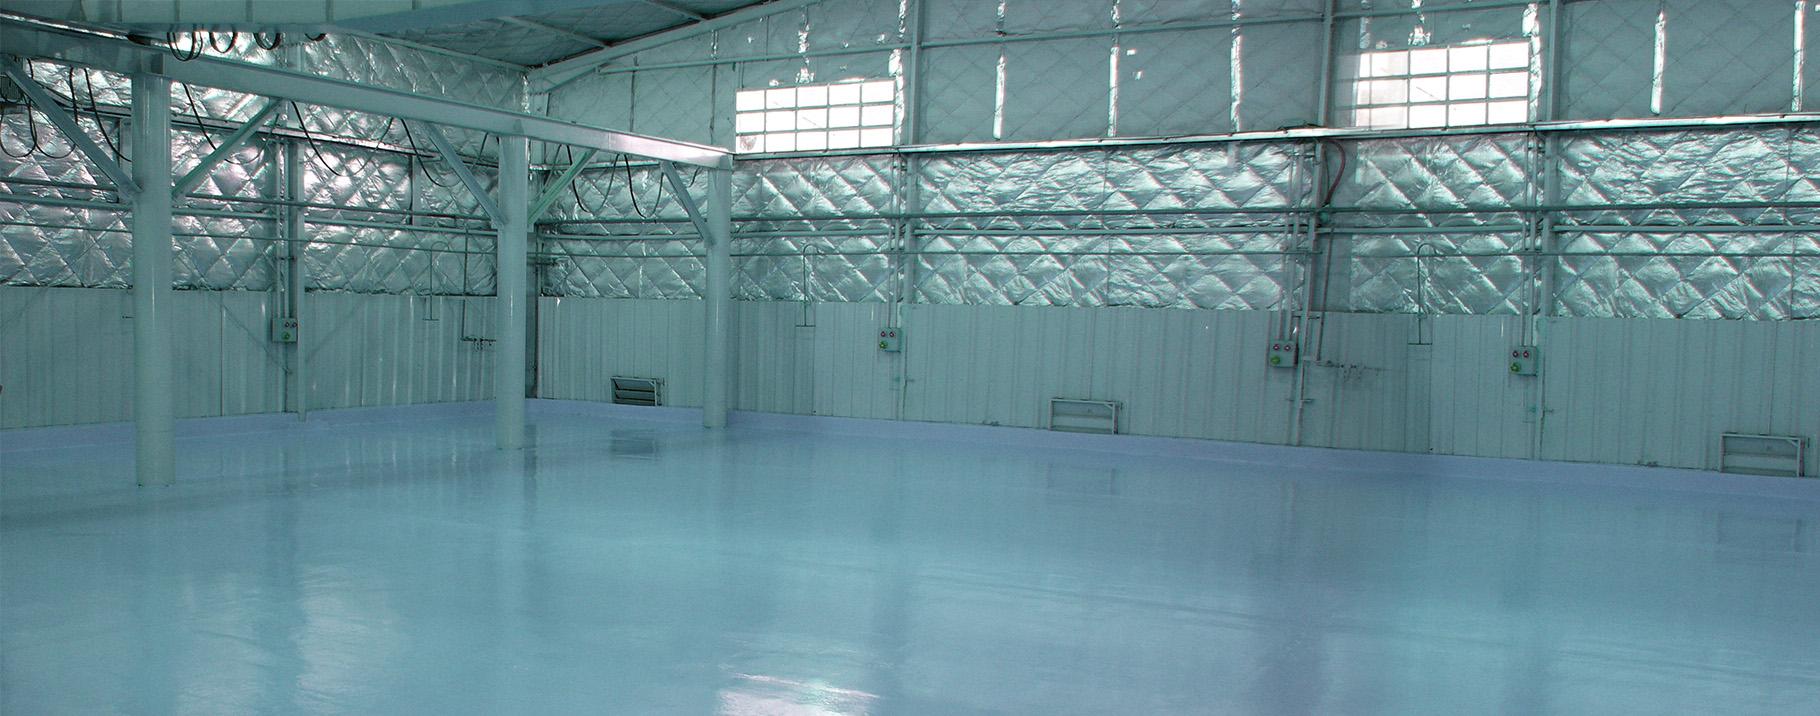 -Polyurethane floor